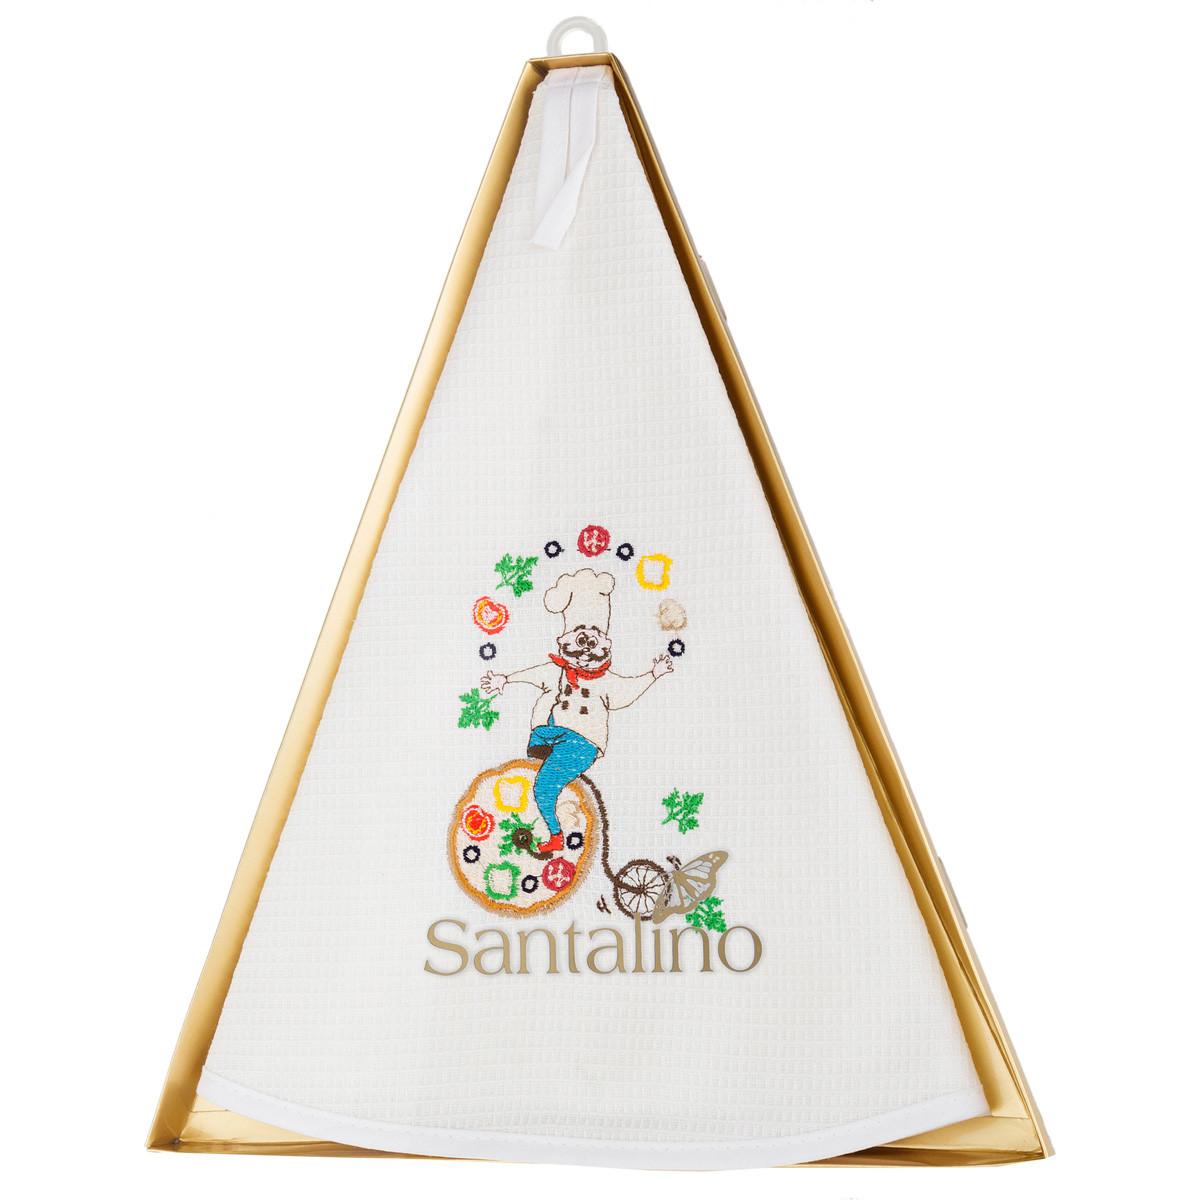 {} Santalino Кухонное полотенце Amey (круглая 70 см) santalino кухонное полотенце amey круглая 70 см